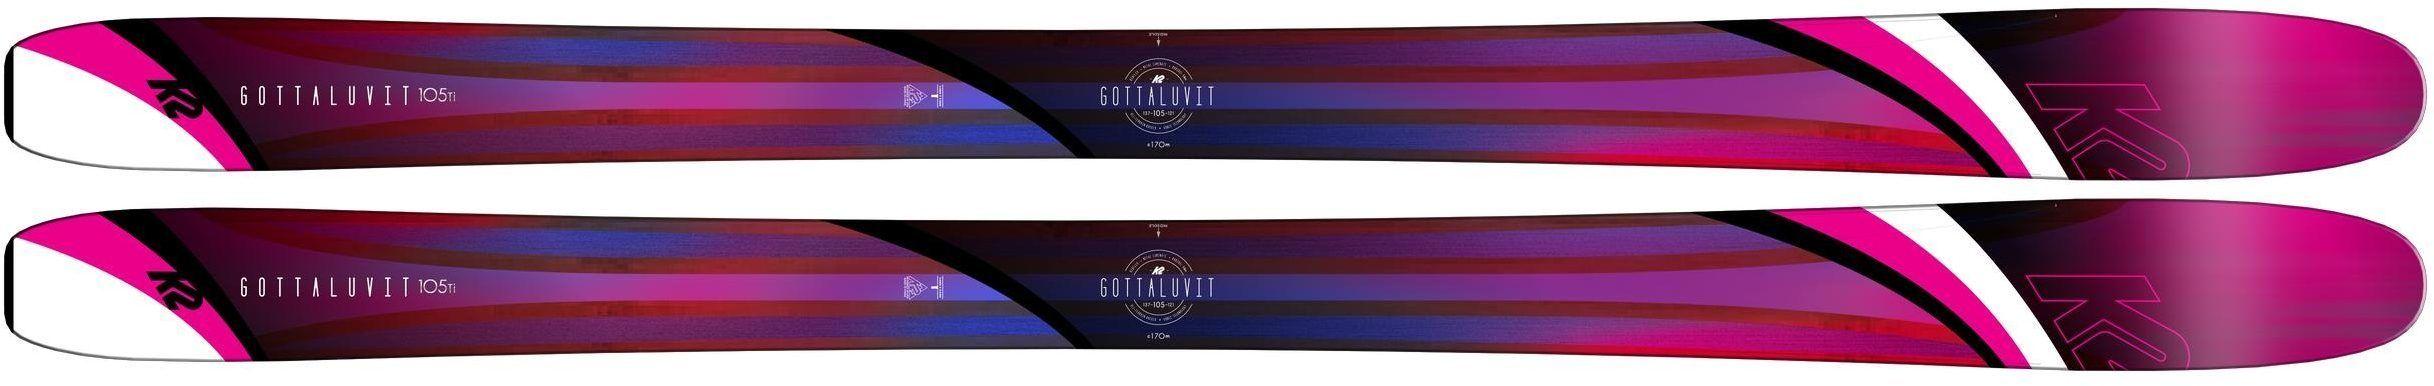 GOTTALUVIT 105TI